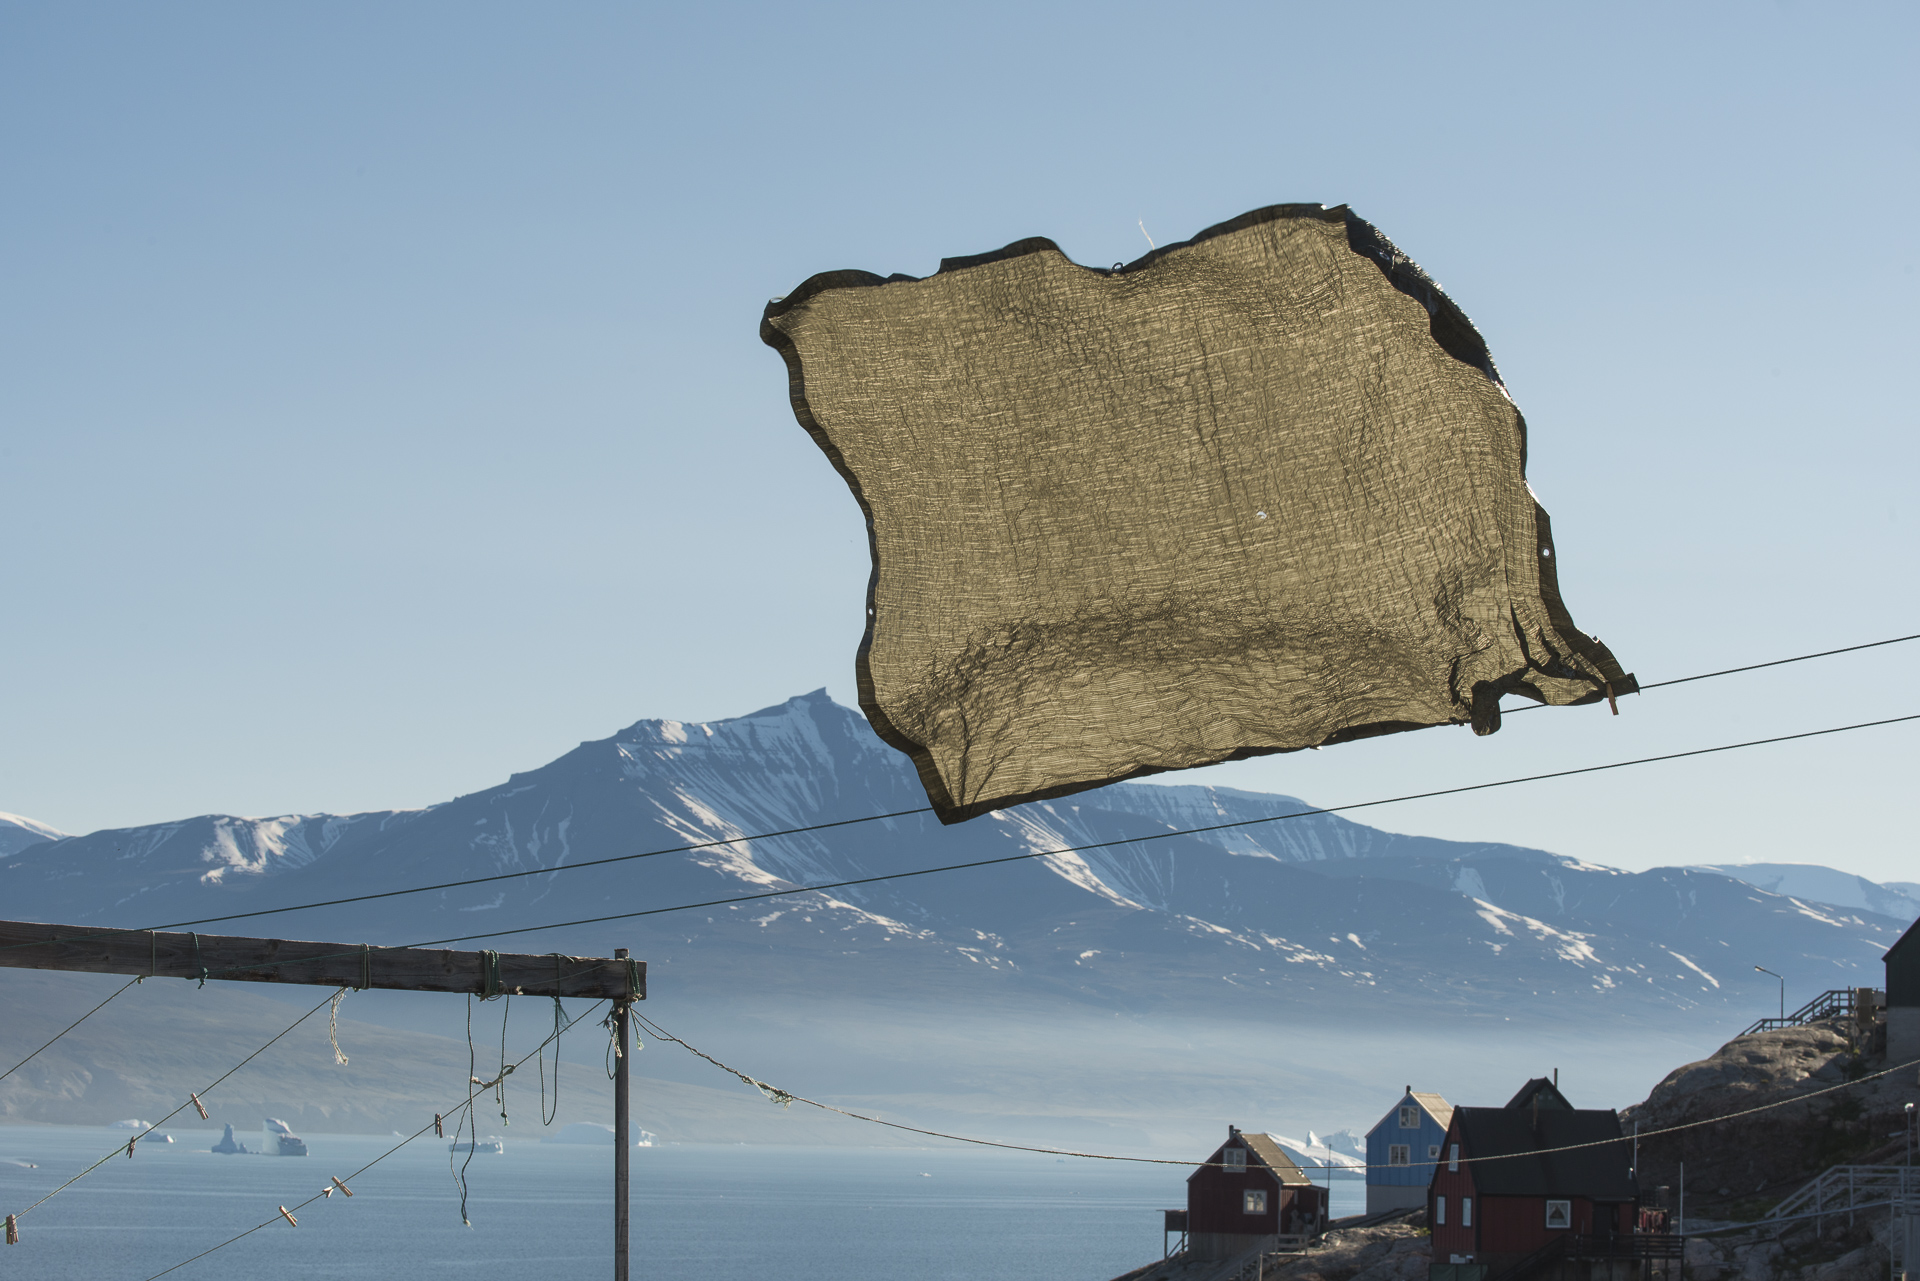 Defibaugh_Greenland_Uummannaq_b_59.jpg